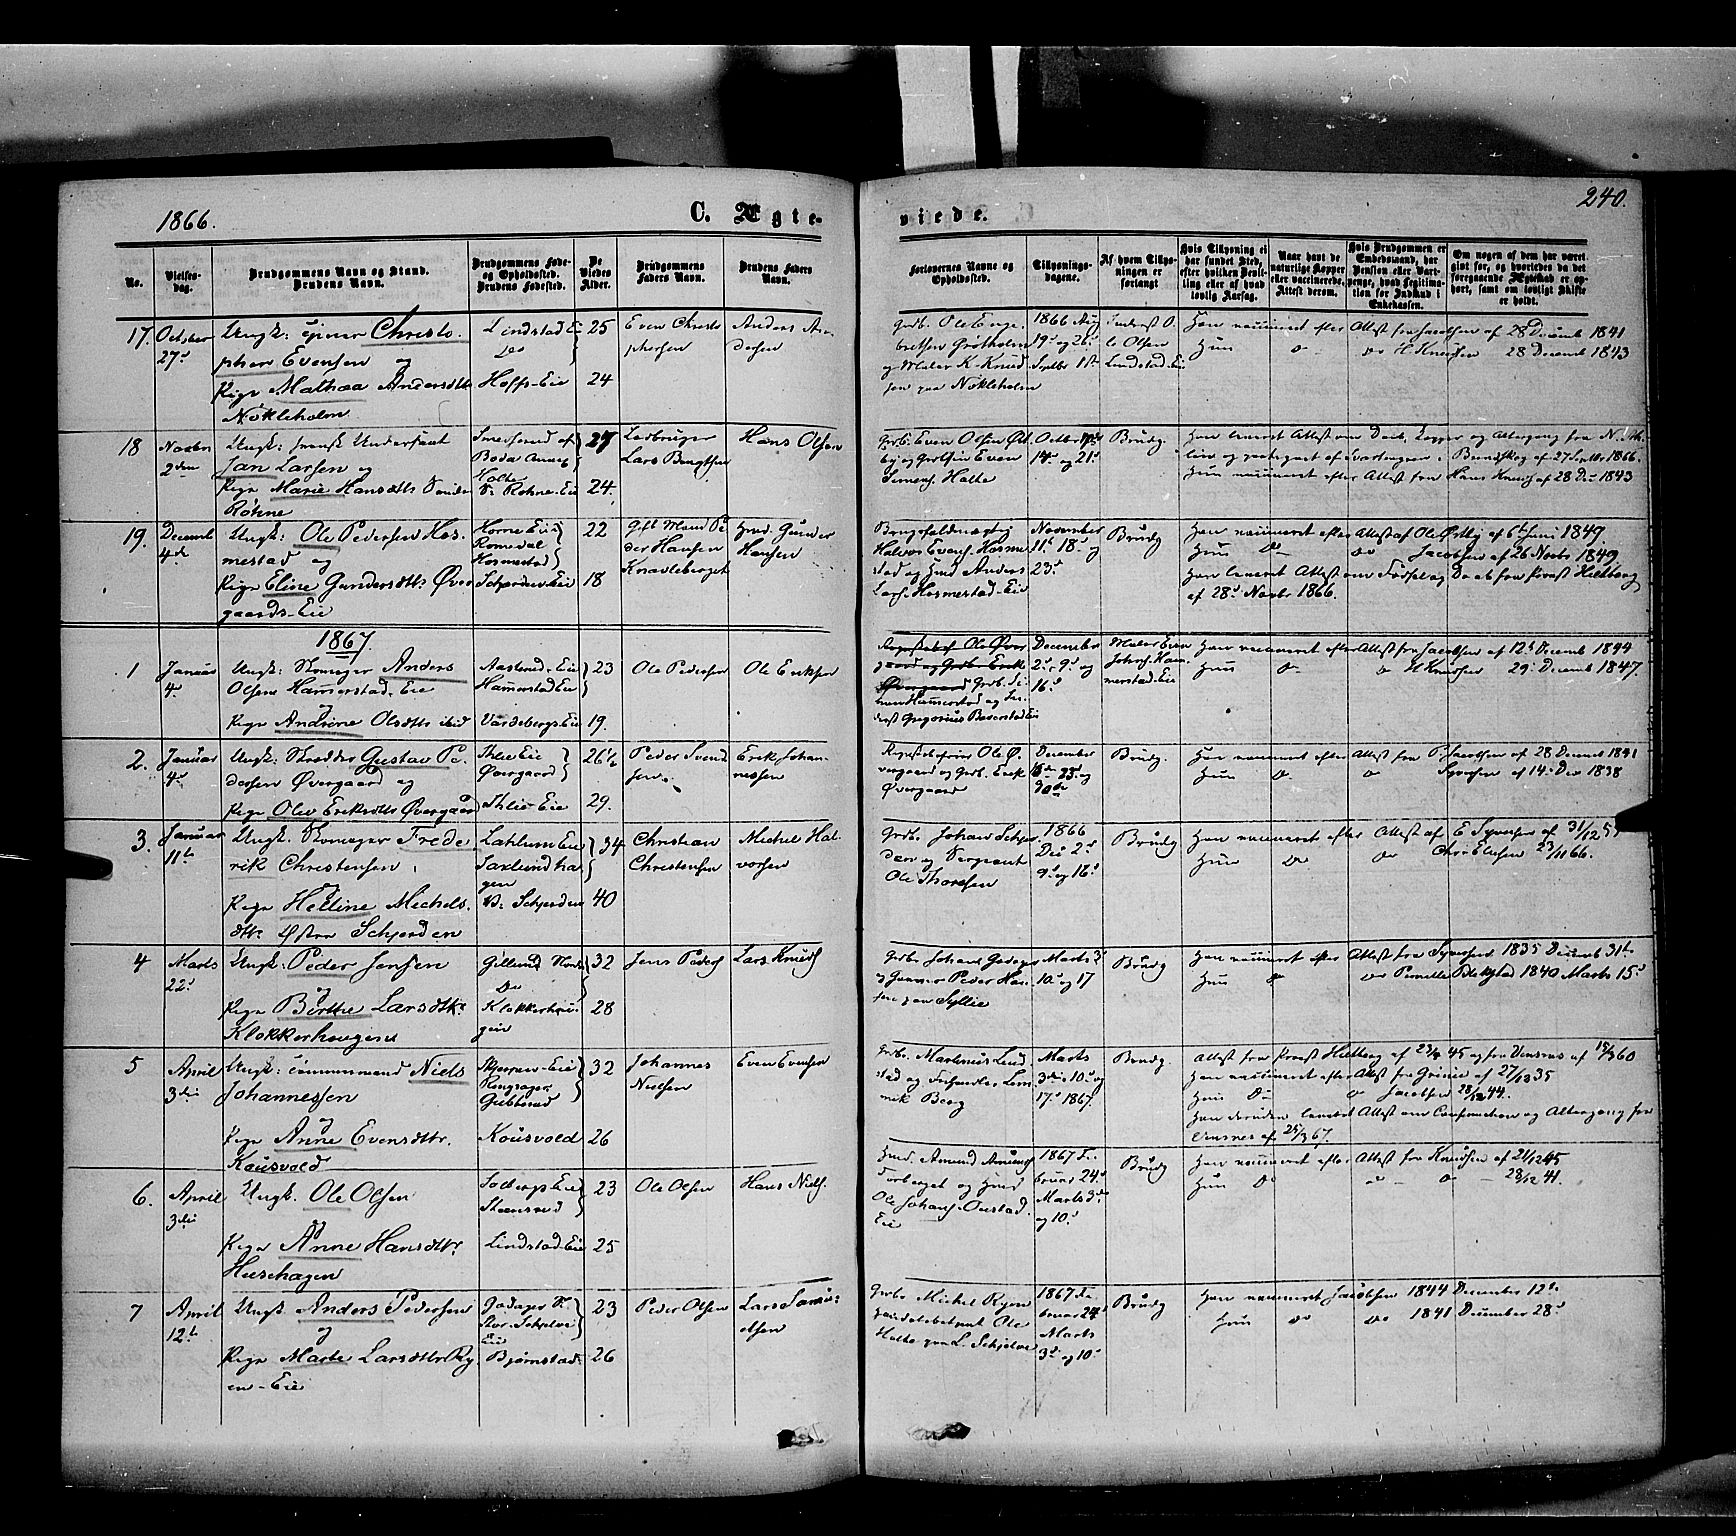 SAH, Stange prestekontor, K/L0013: Ministerialbok nr. 13, 1862-1879, s. 240